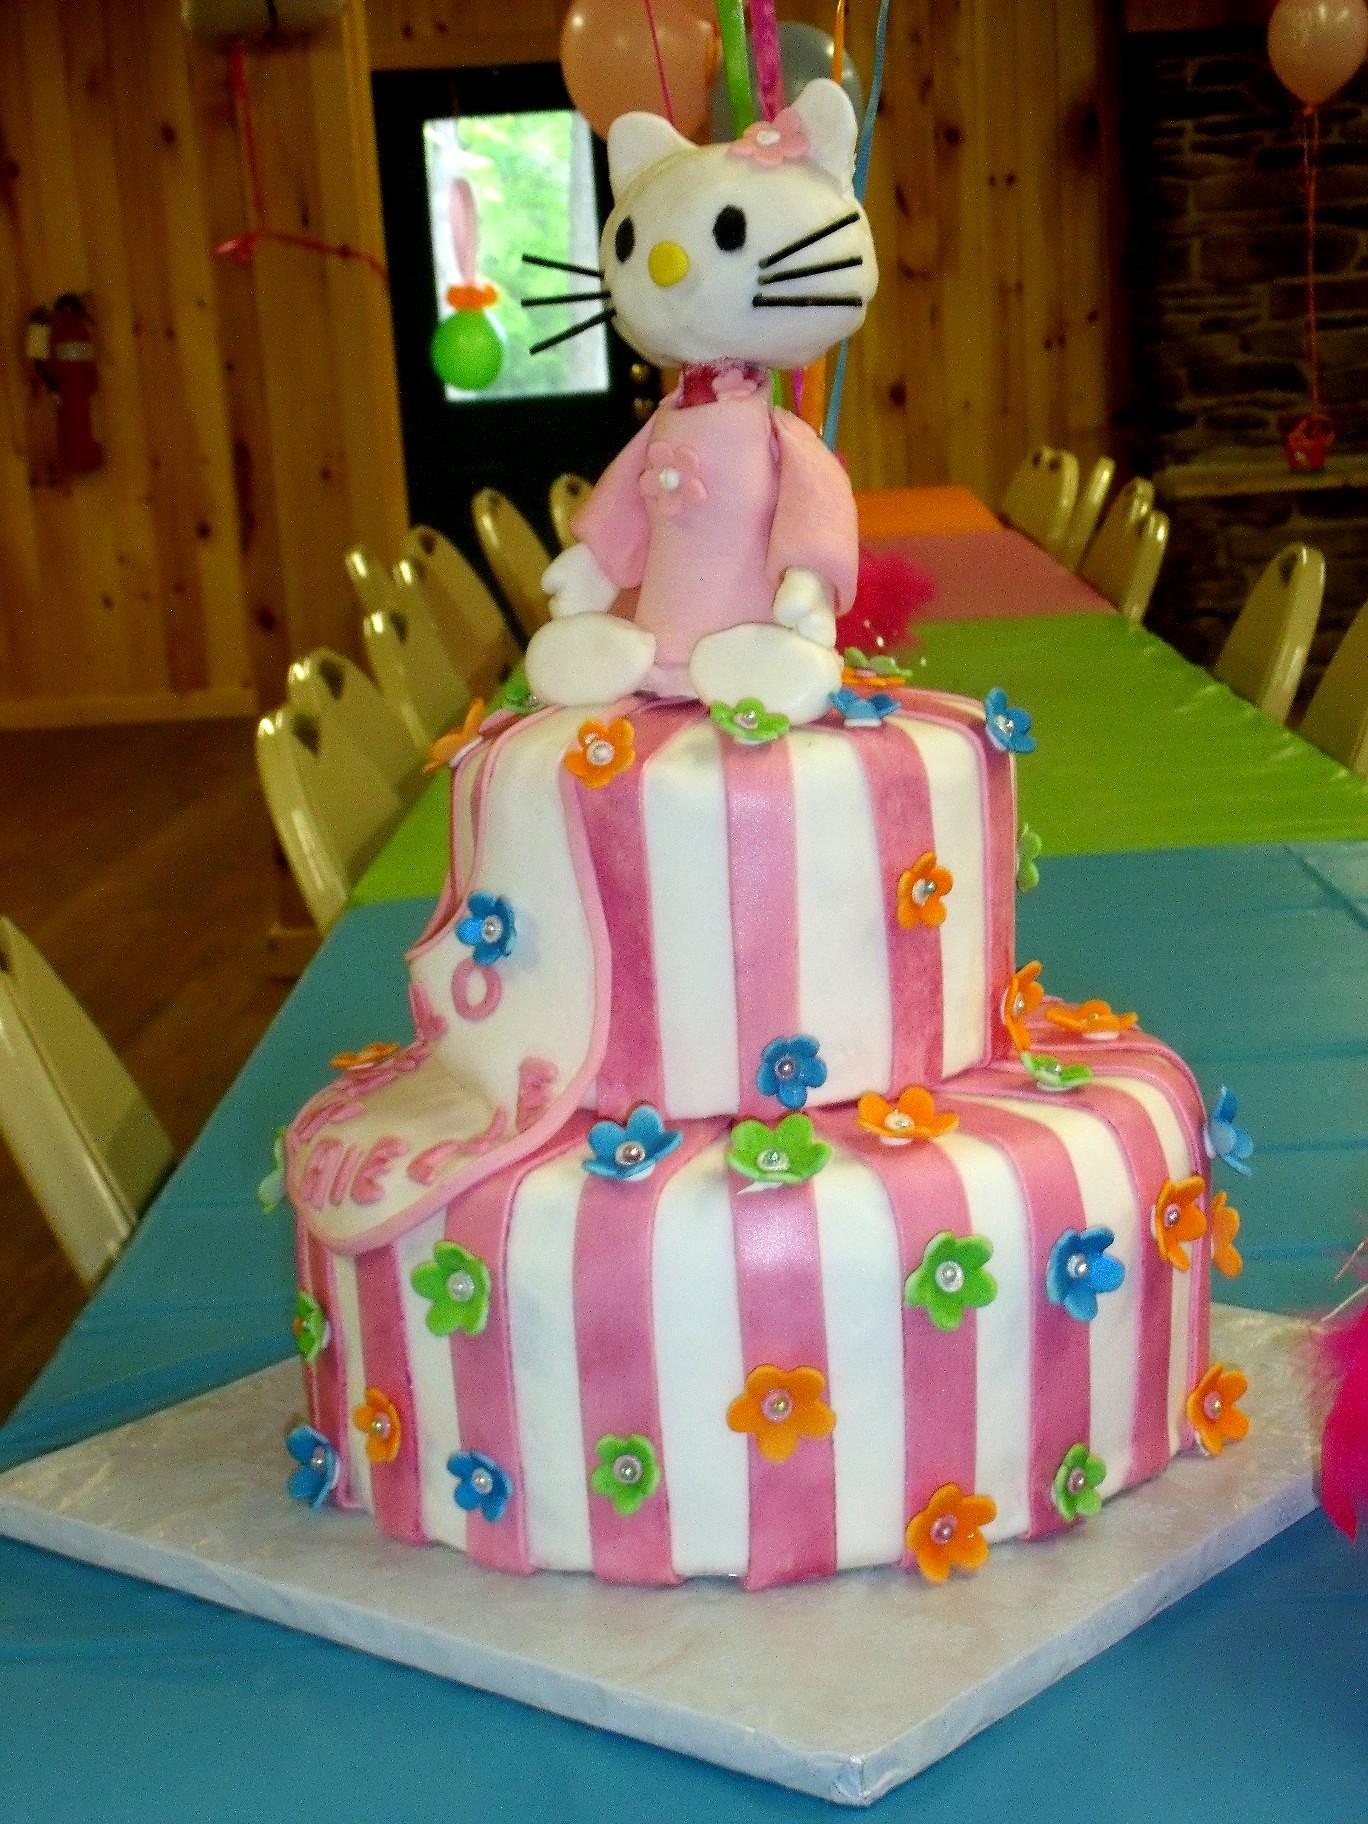 Hello Kitty Baby Shower Cake View 2. View Full Size · View Slideshow.